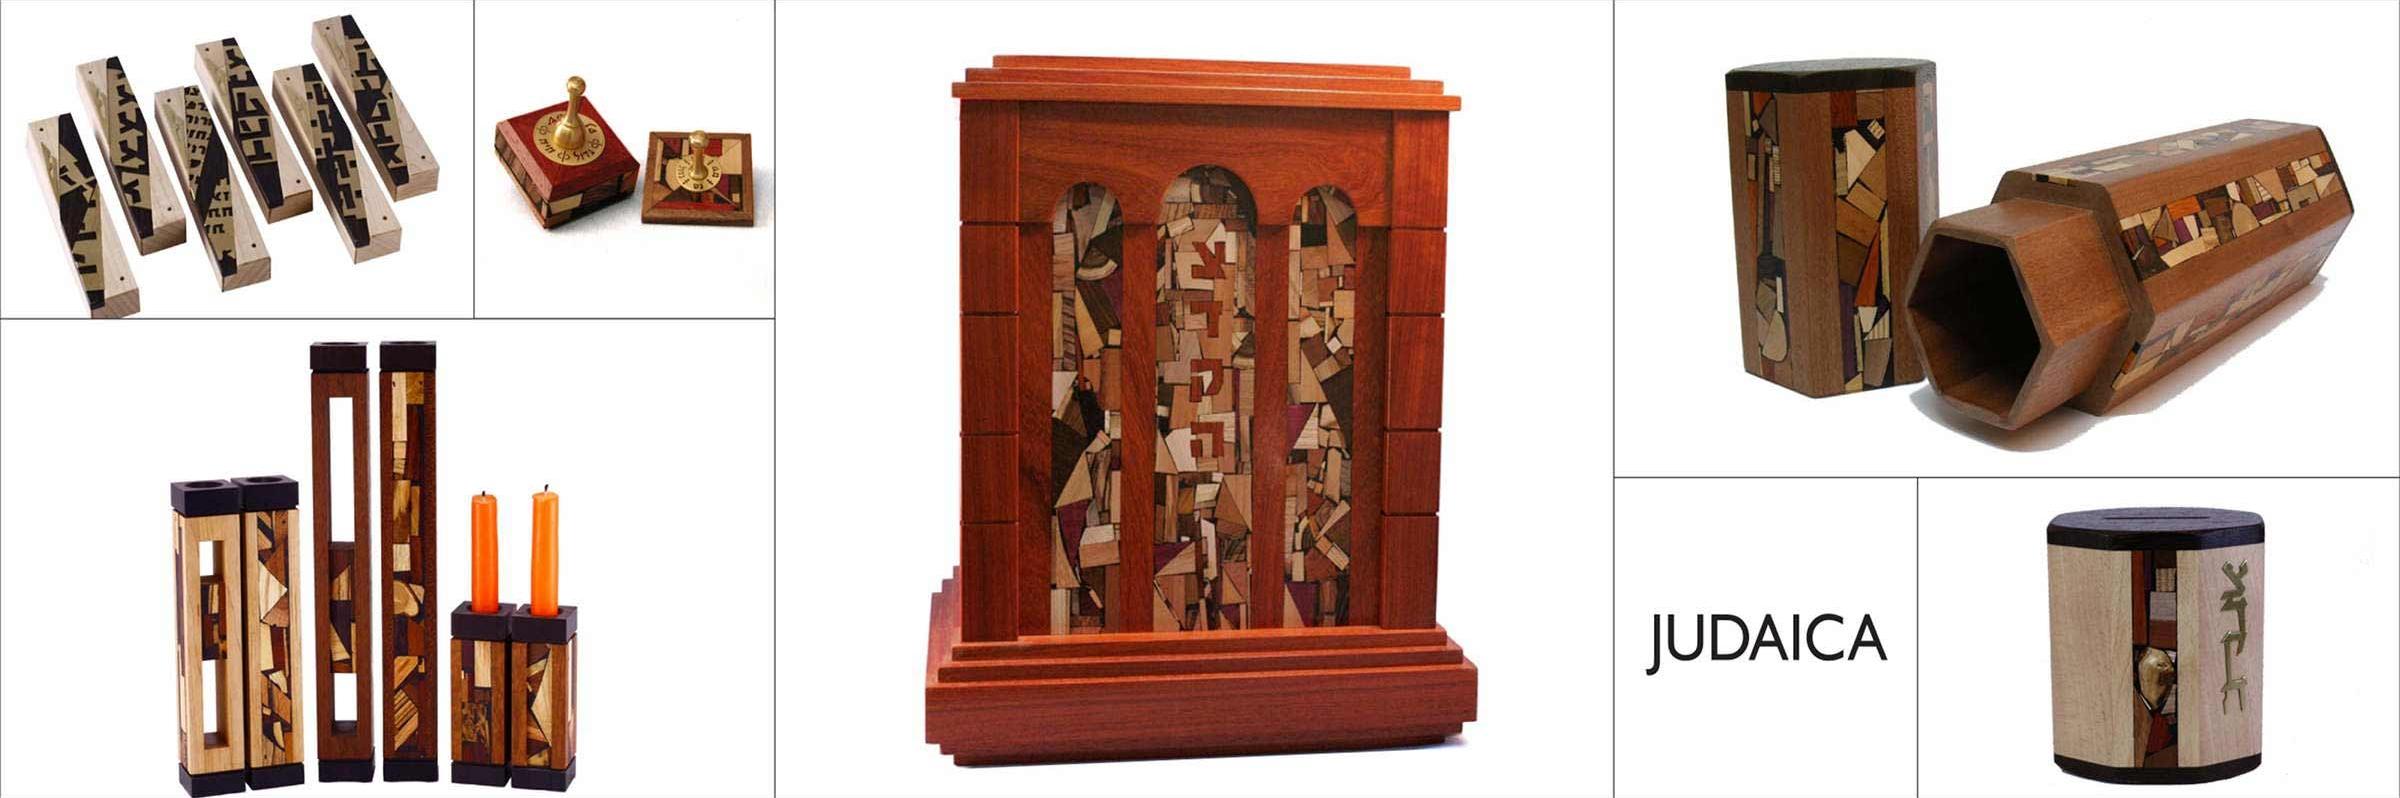 JudaicaBannerSmall-Etz-Ron-Handcrafted-Wooden-Judaica-Wood-Art–Home-Decor-Handmade-Jewelry-Website_banner-2-S_black-01-RW-2400-800_opt